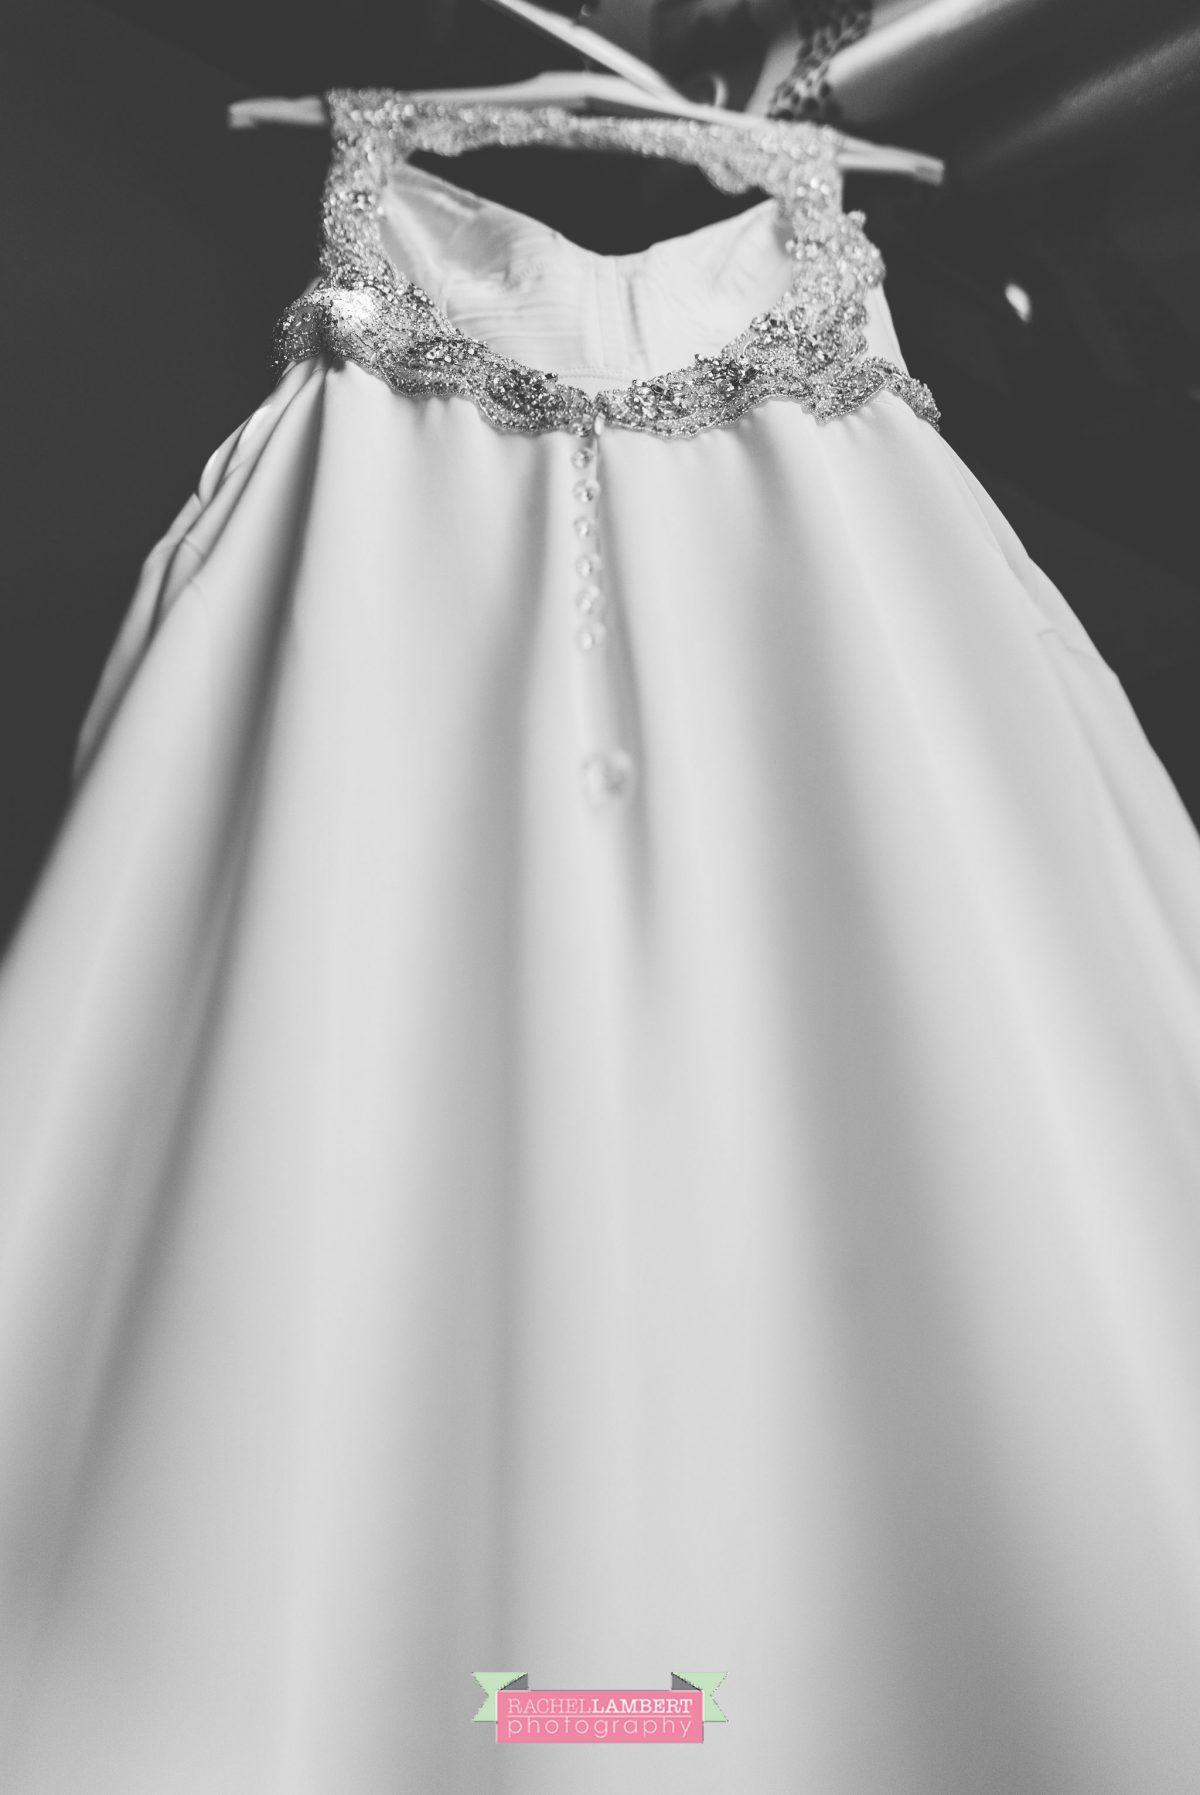 Rachel Lambert Photography llanerch vineyard wedding photographer bridal dress laura may bridal